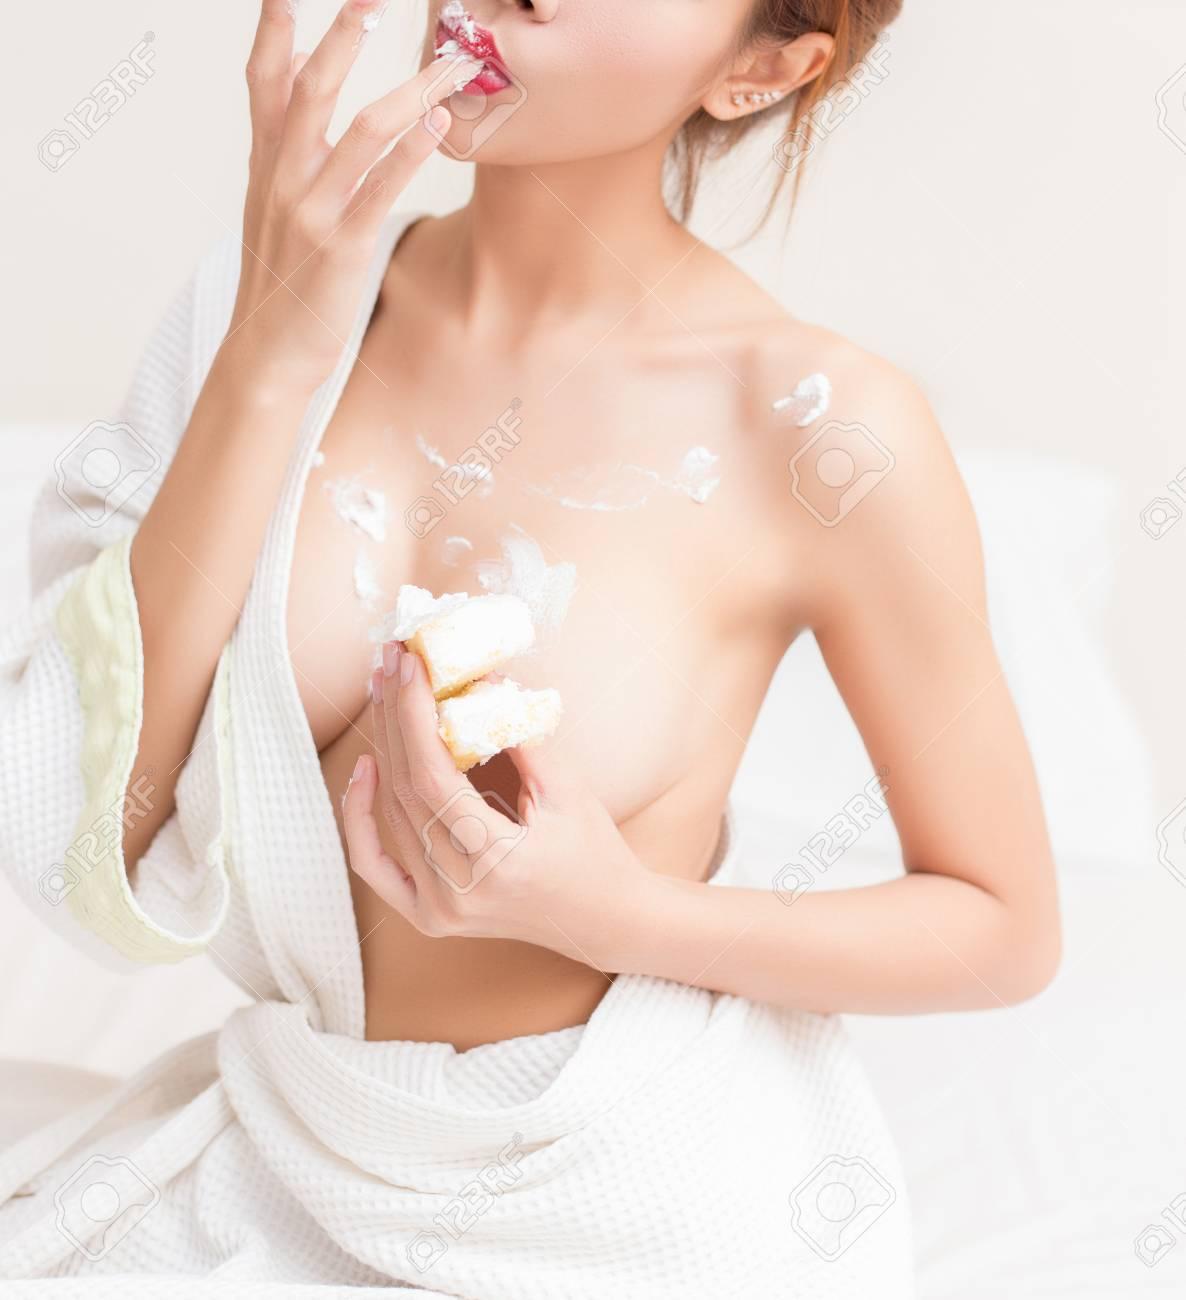 Playboy girls nude spreading their pussy